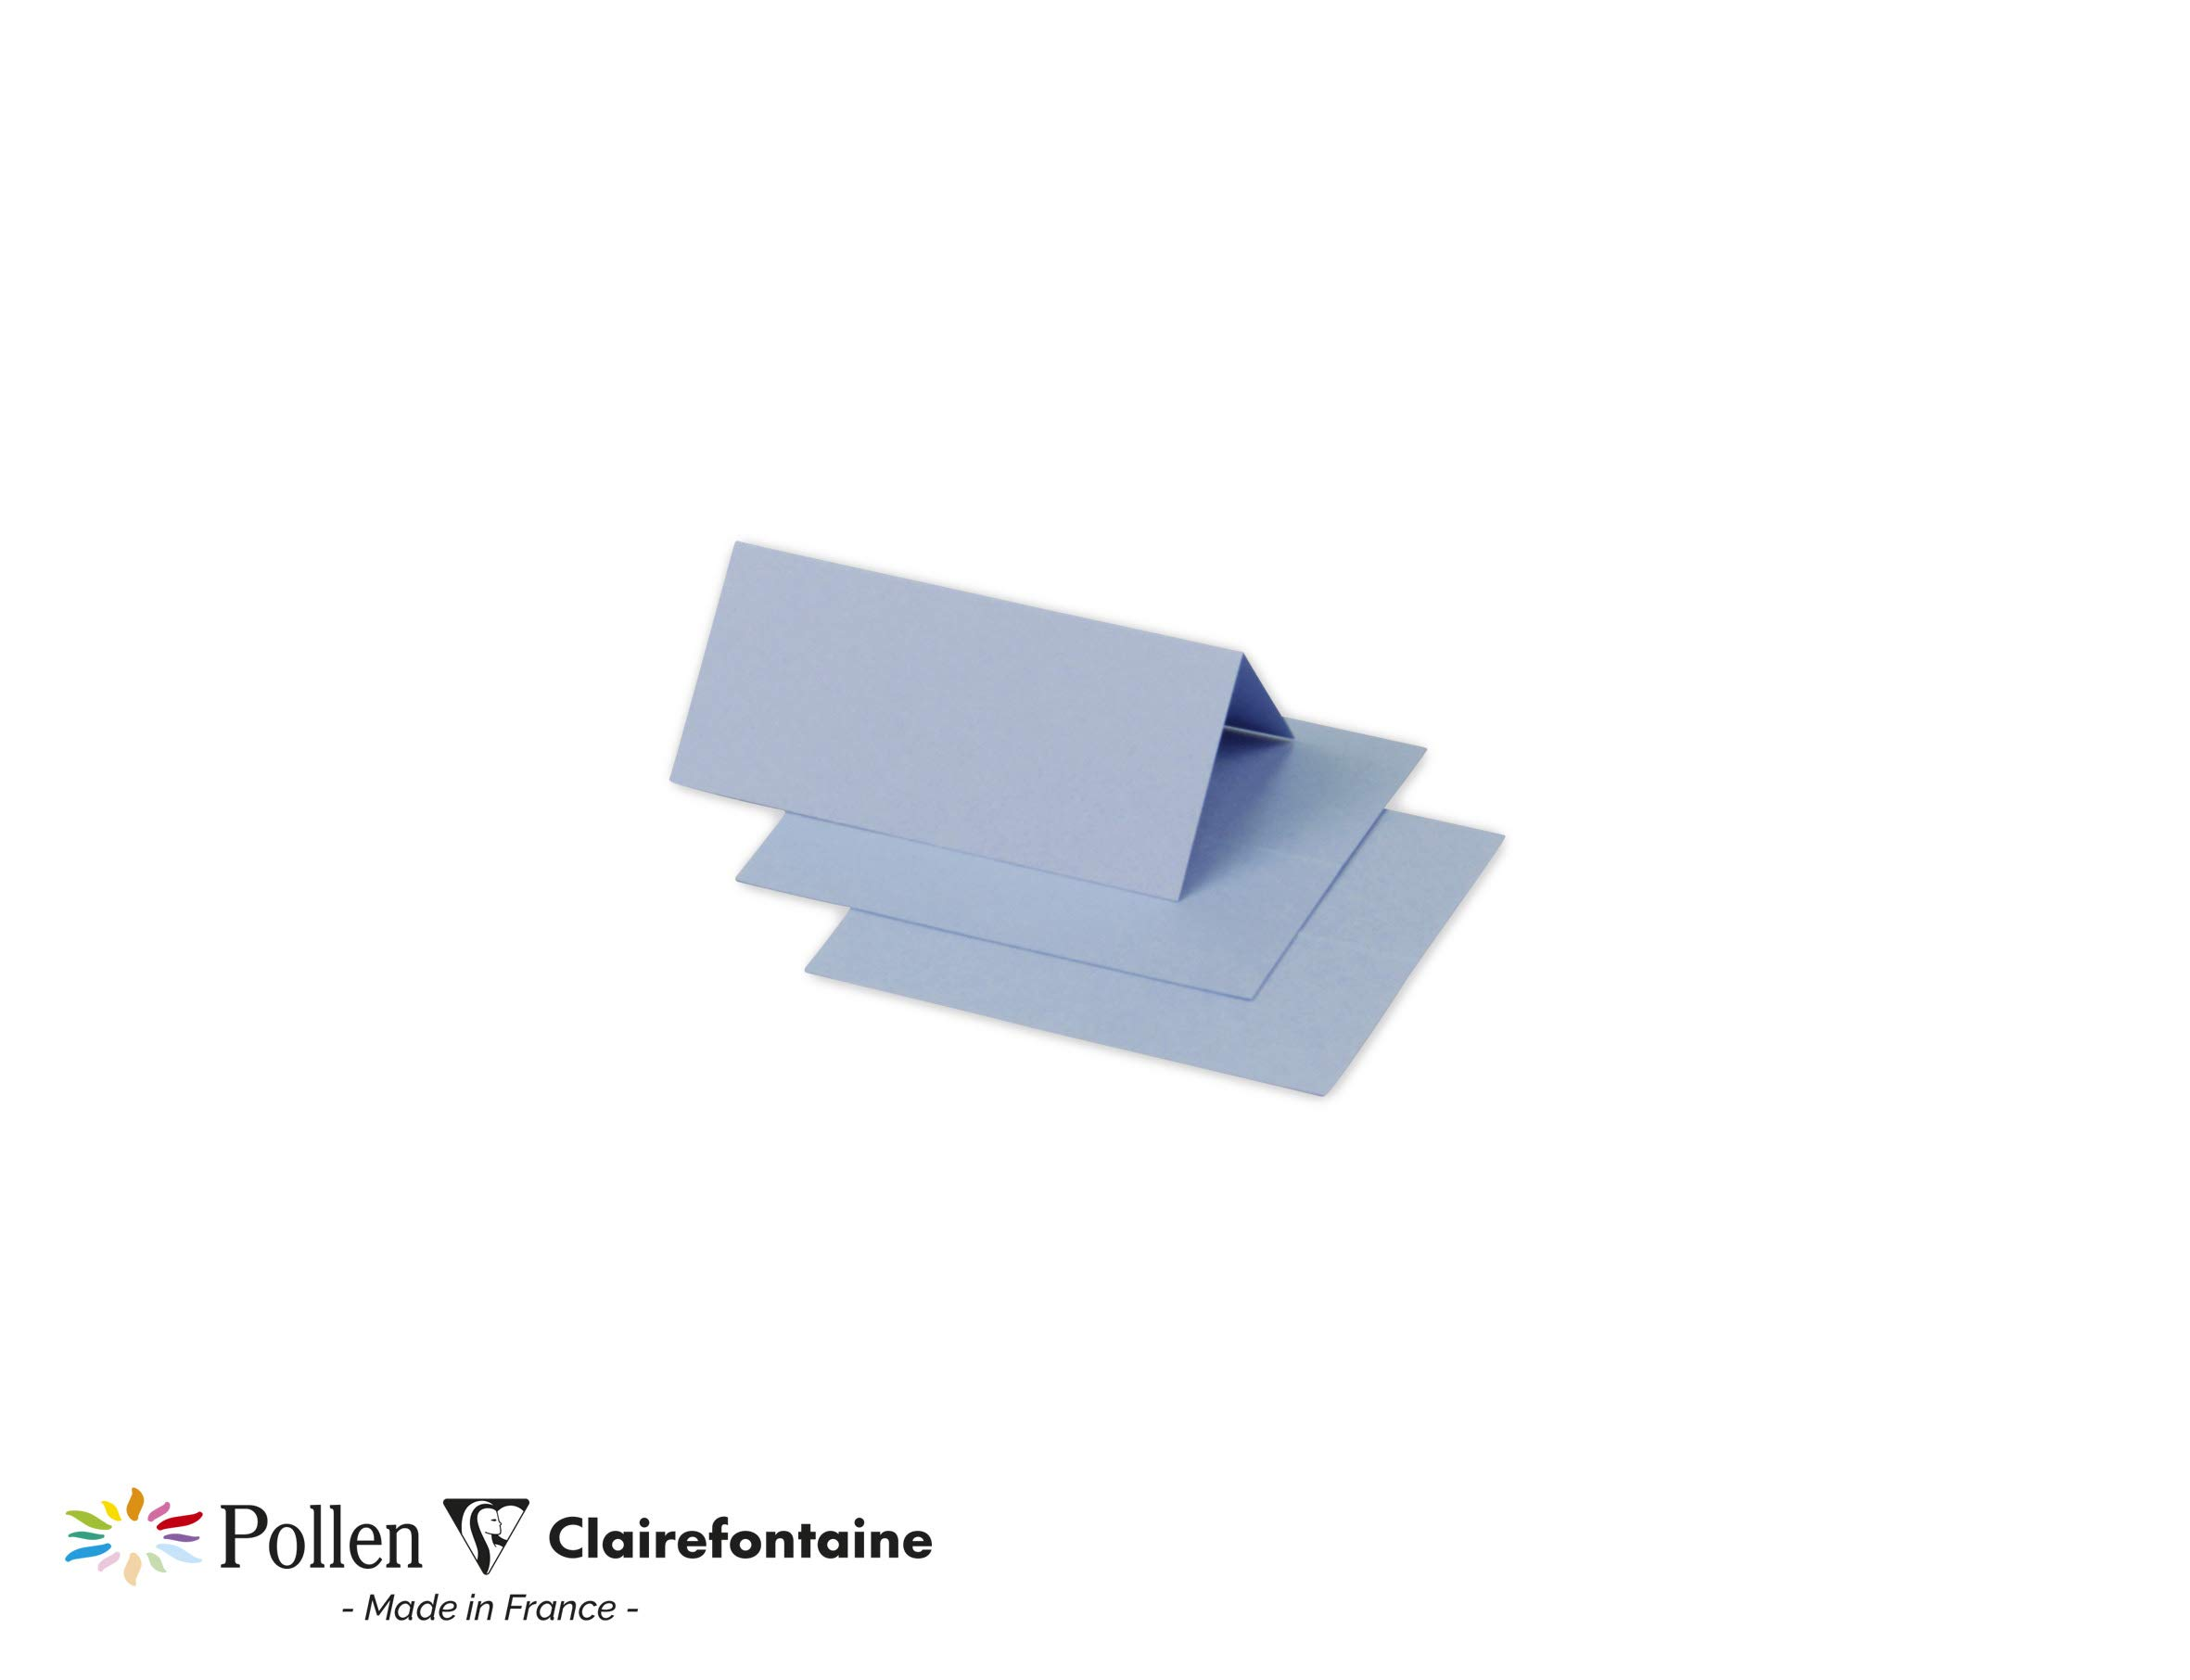 Clairefontaine Pollen Pack of 25–Ref 75039°C Laser 8x8,5cm, Lavender Blue